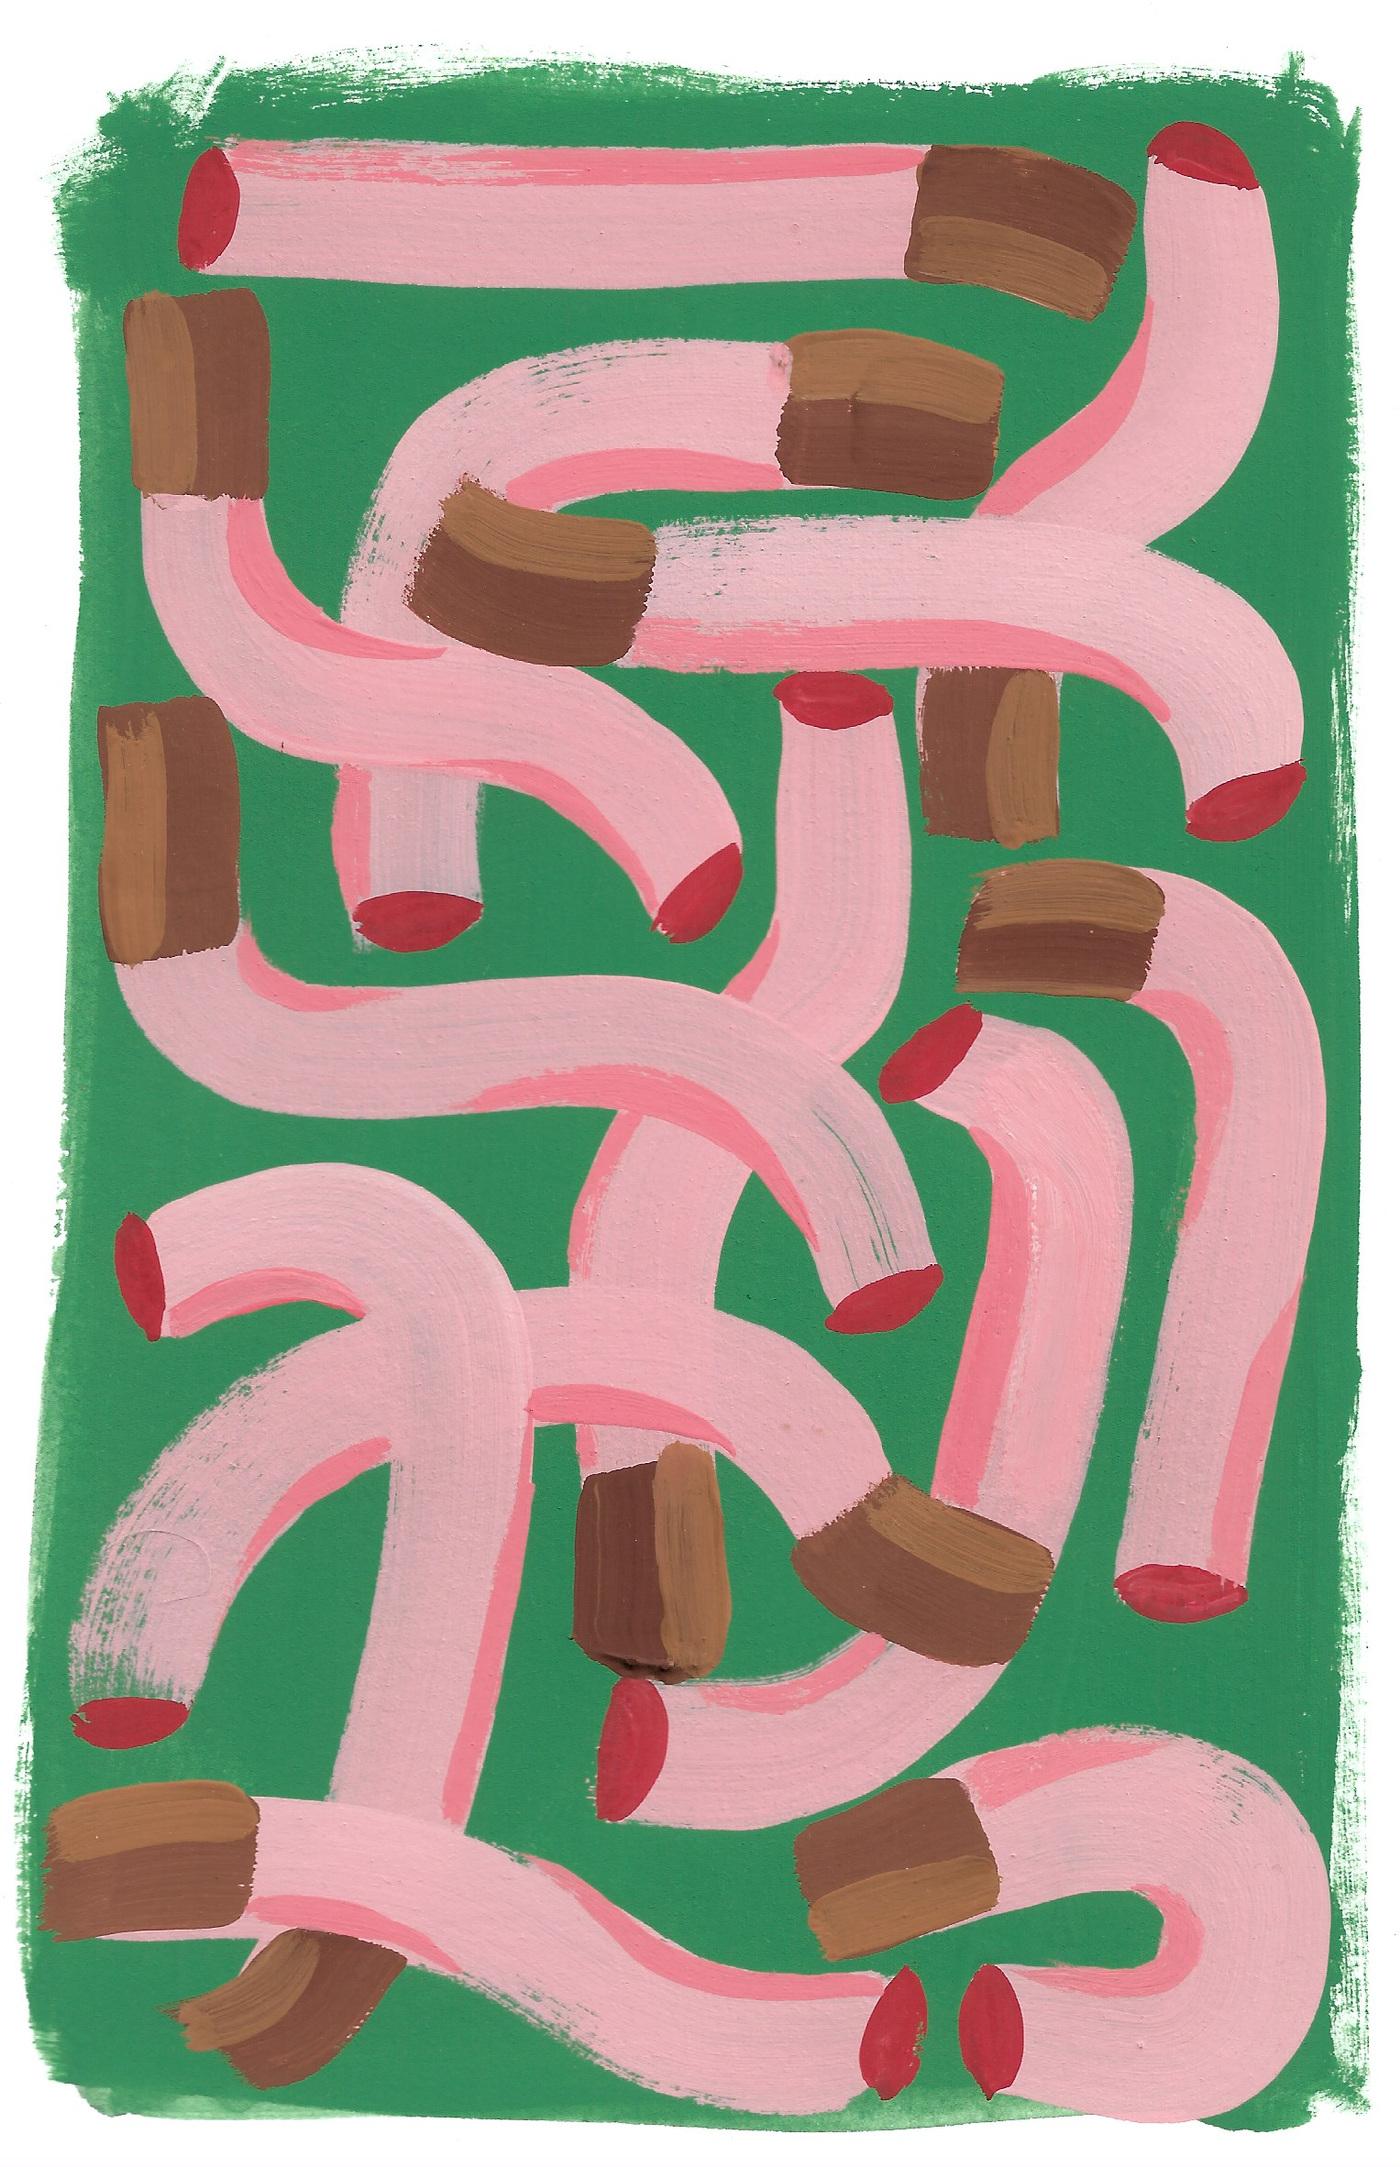 Anna Choutova - Cigarette Worms 1 Gouache on Paper21 cm x 15 cm